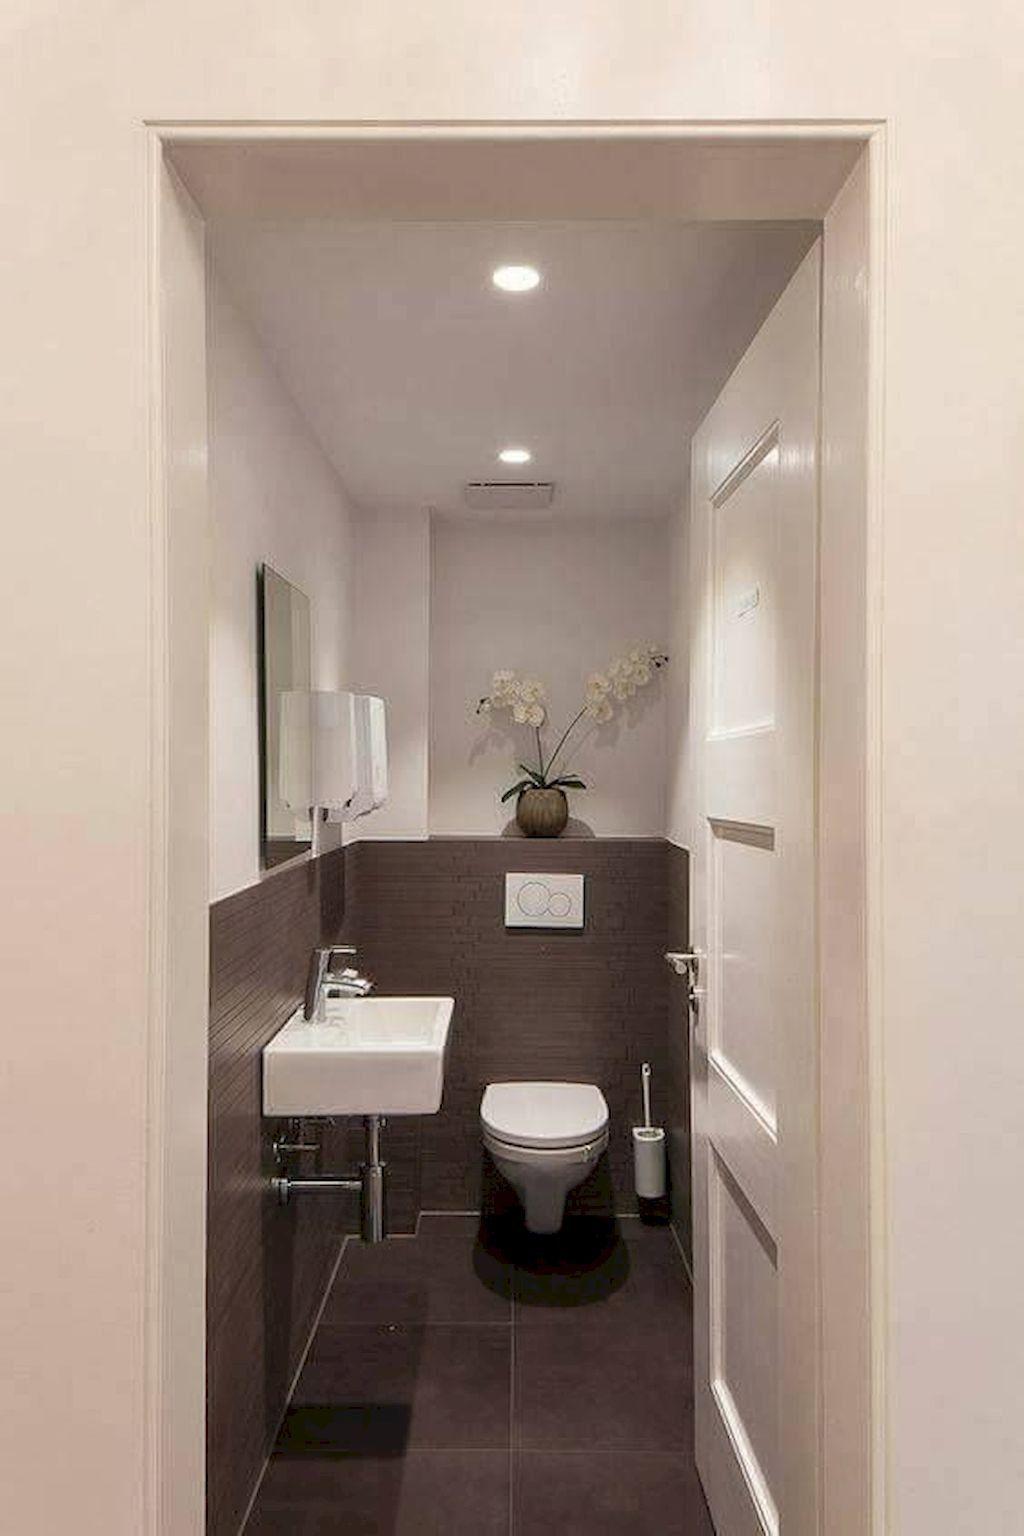 Space Saving Toilet Design For Small Bathroom Home To Z Toilet Design Small Toilet Room Bathroom Interior